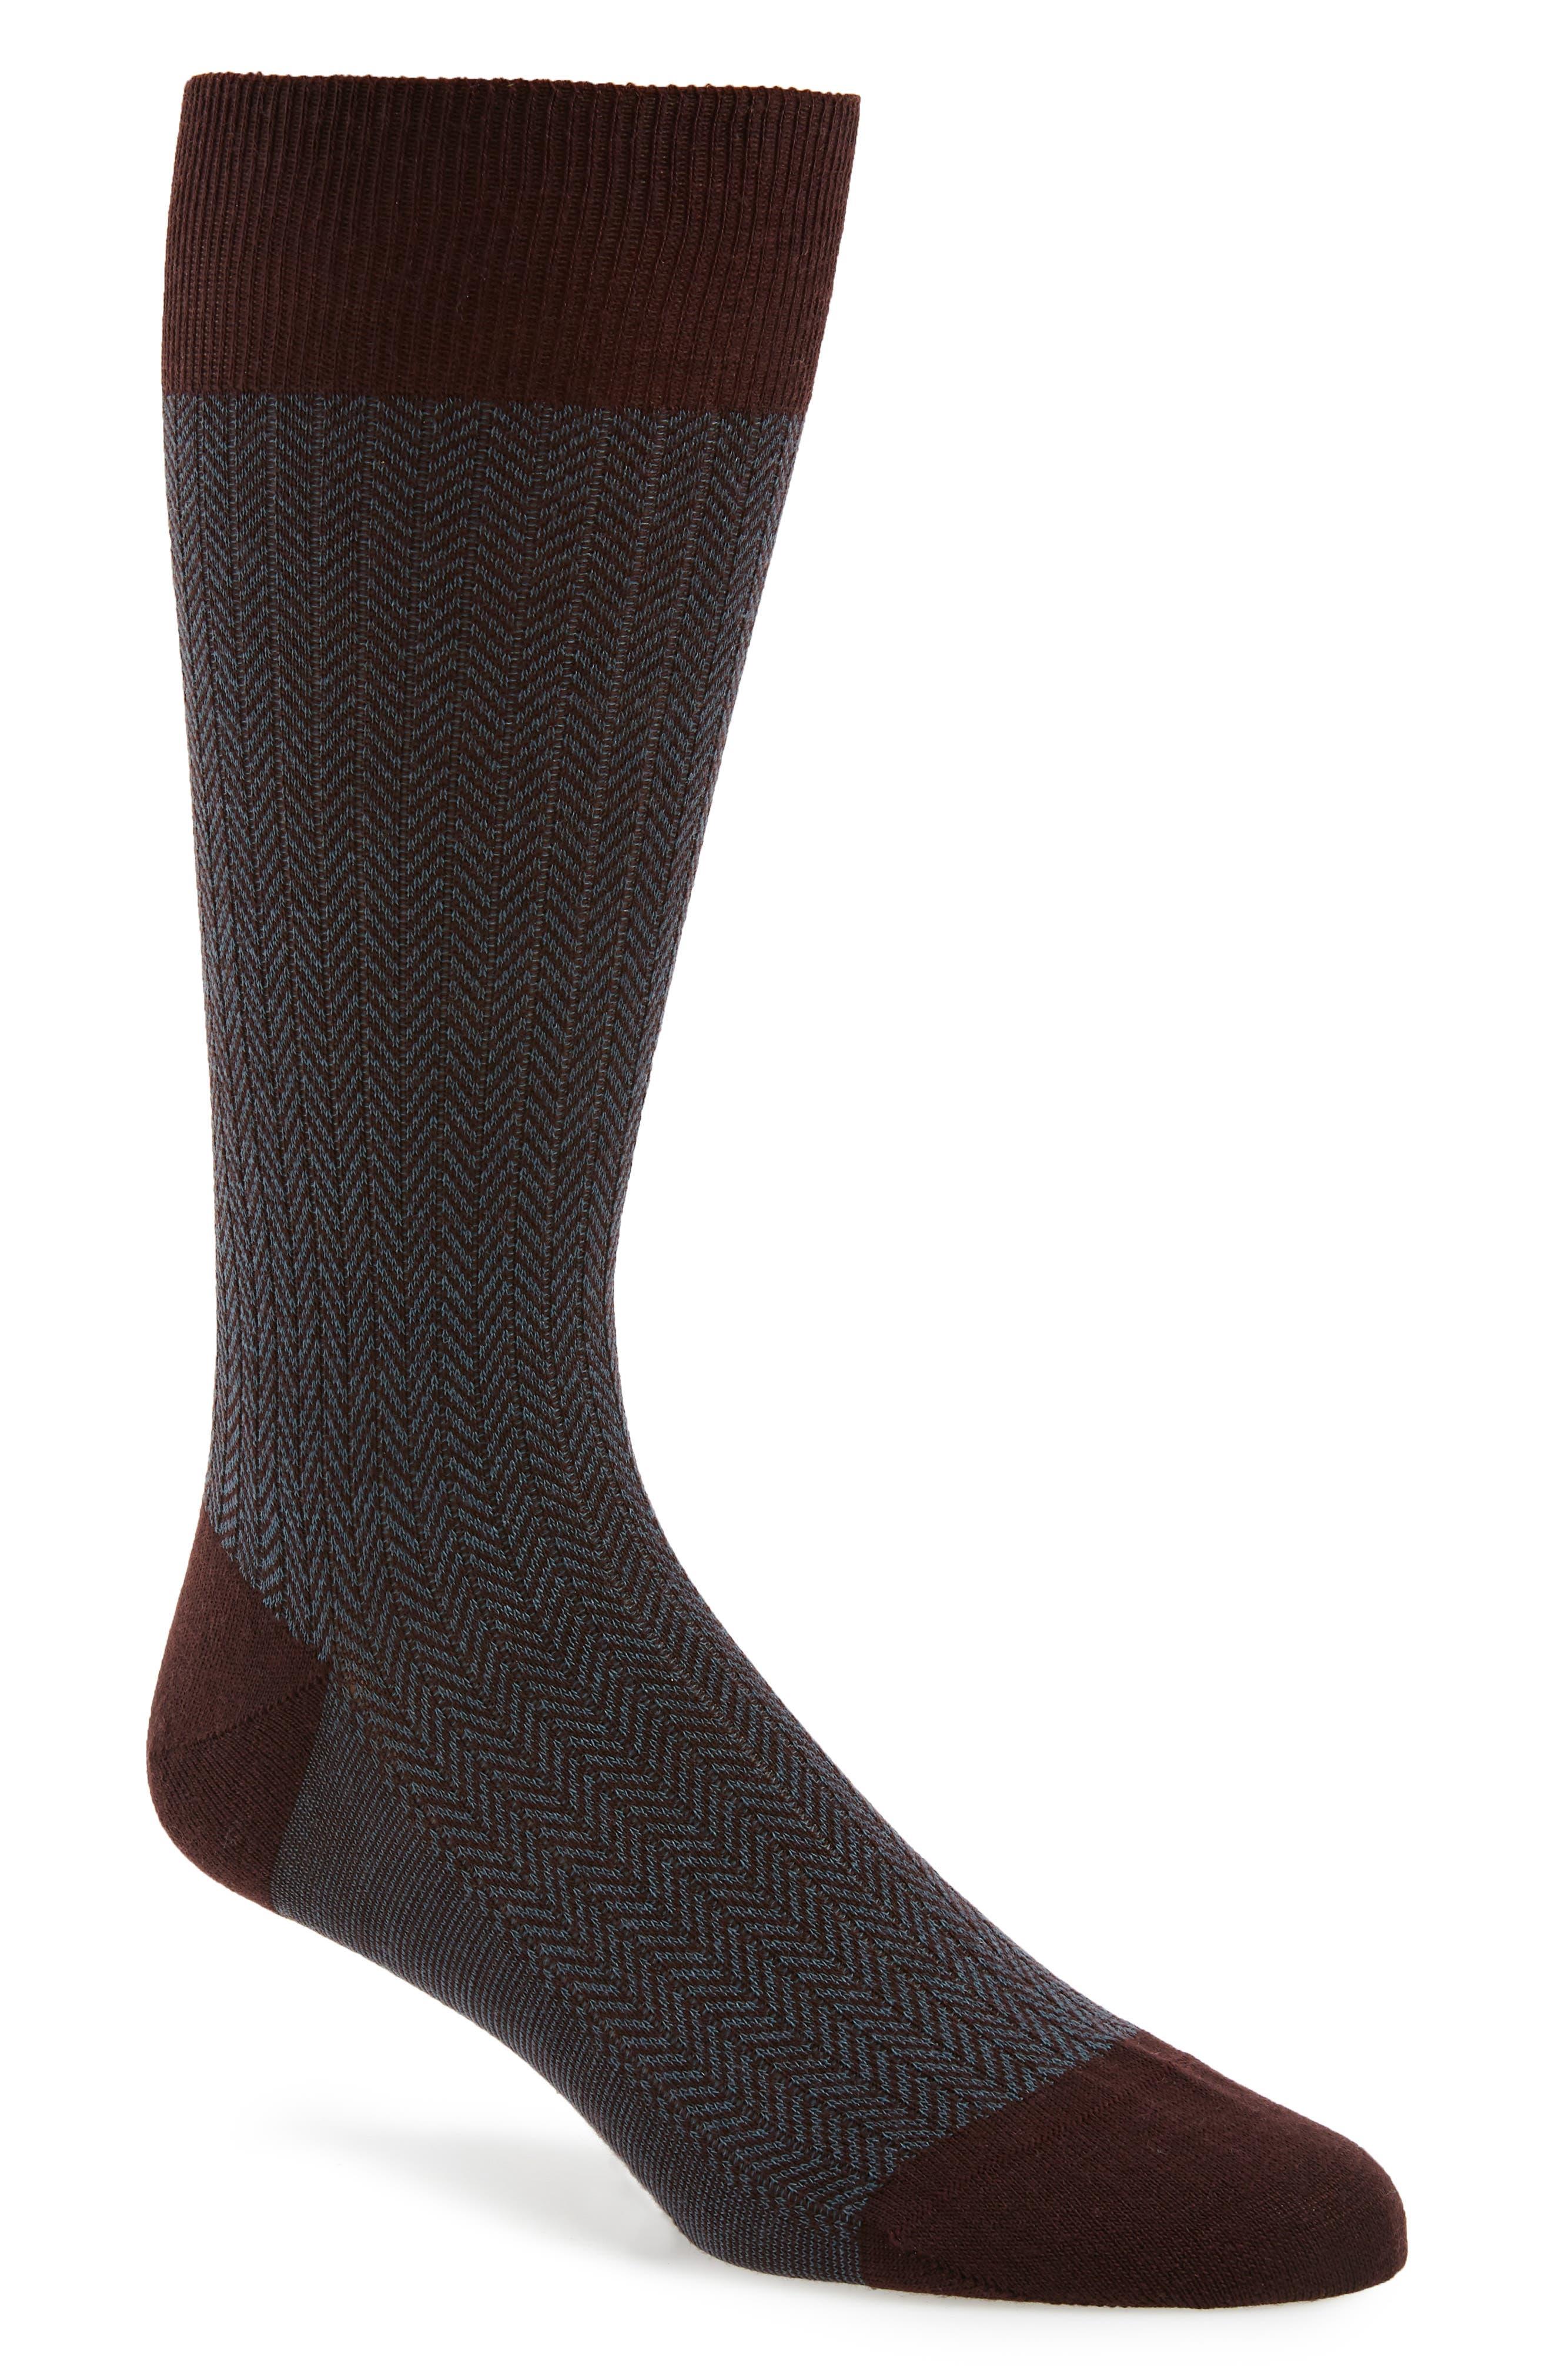 '5911' Mid-Calf Dress Socks,                             Main thumbnail 1, color,                             MAROON 153